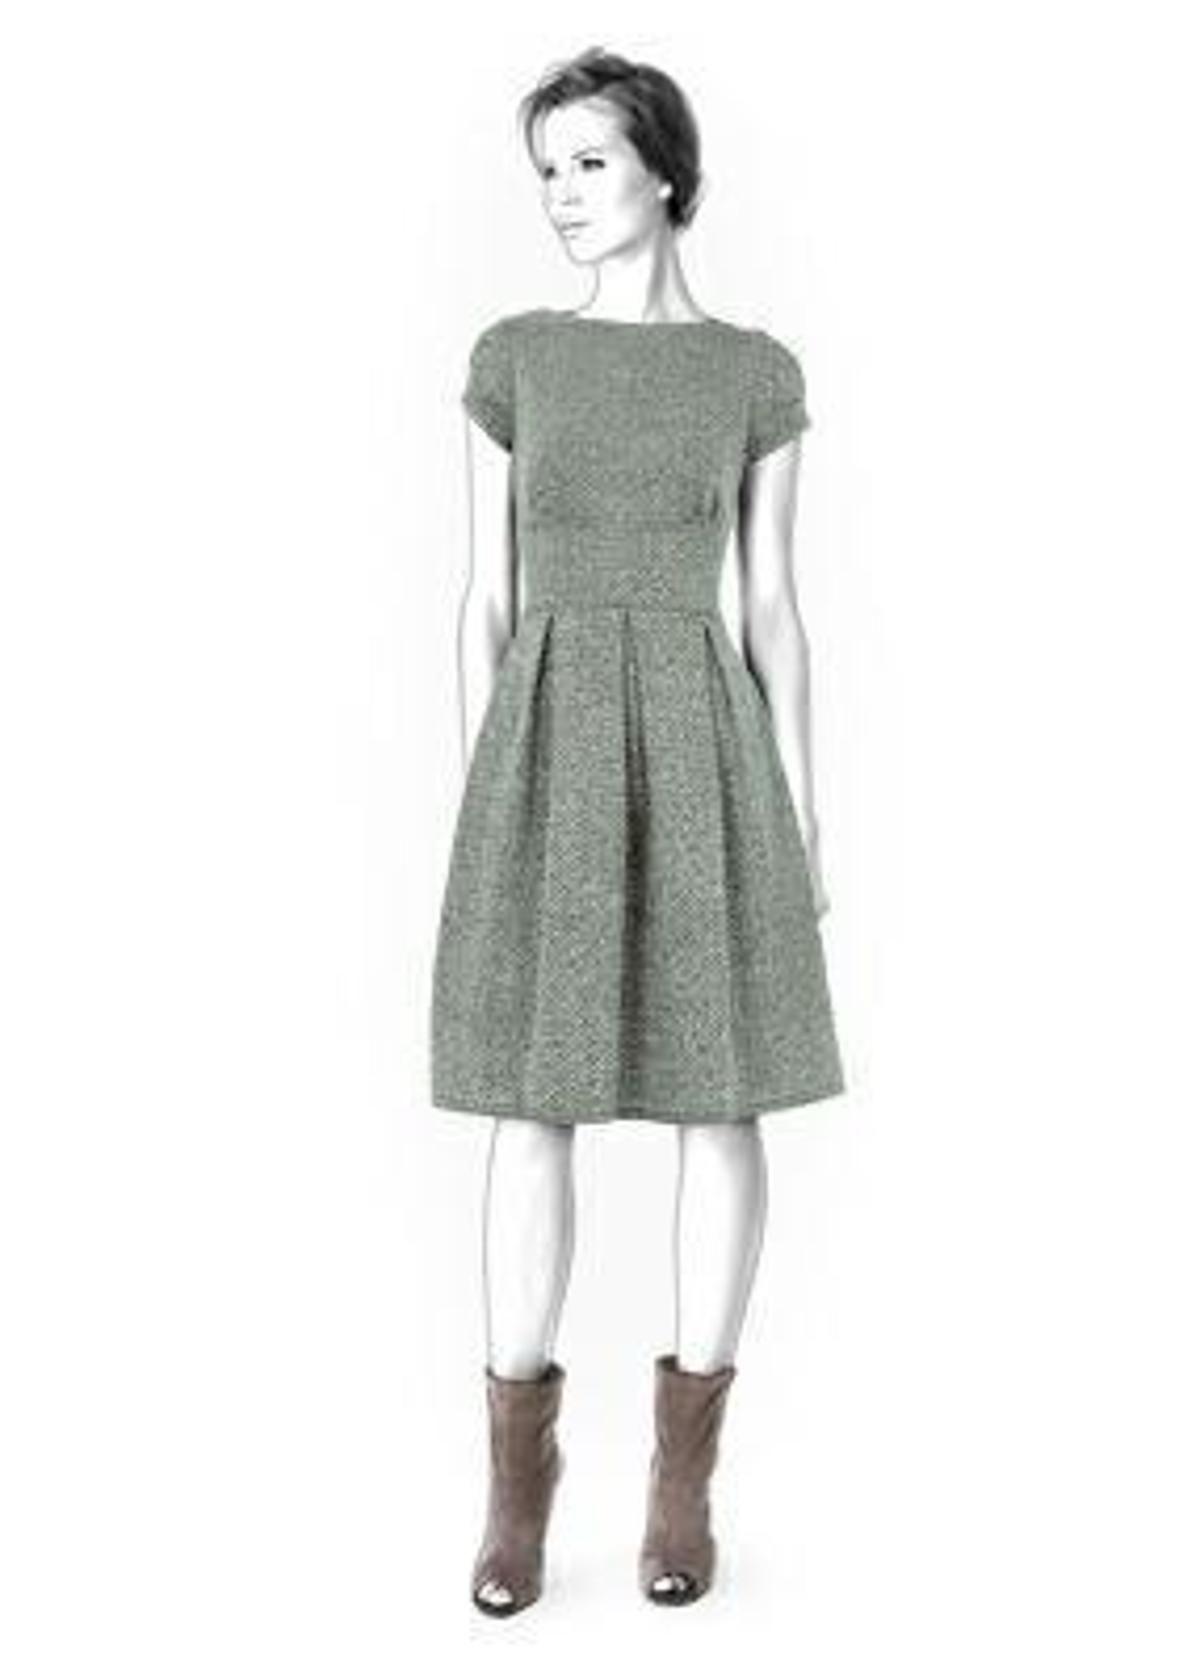 Dress Sewing Pattern 4324 | Dress sewing patterns, Sewing patterns ...